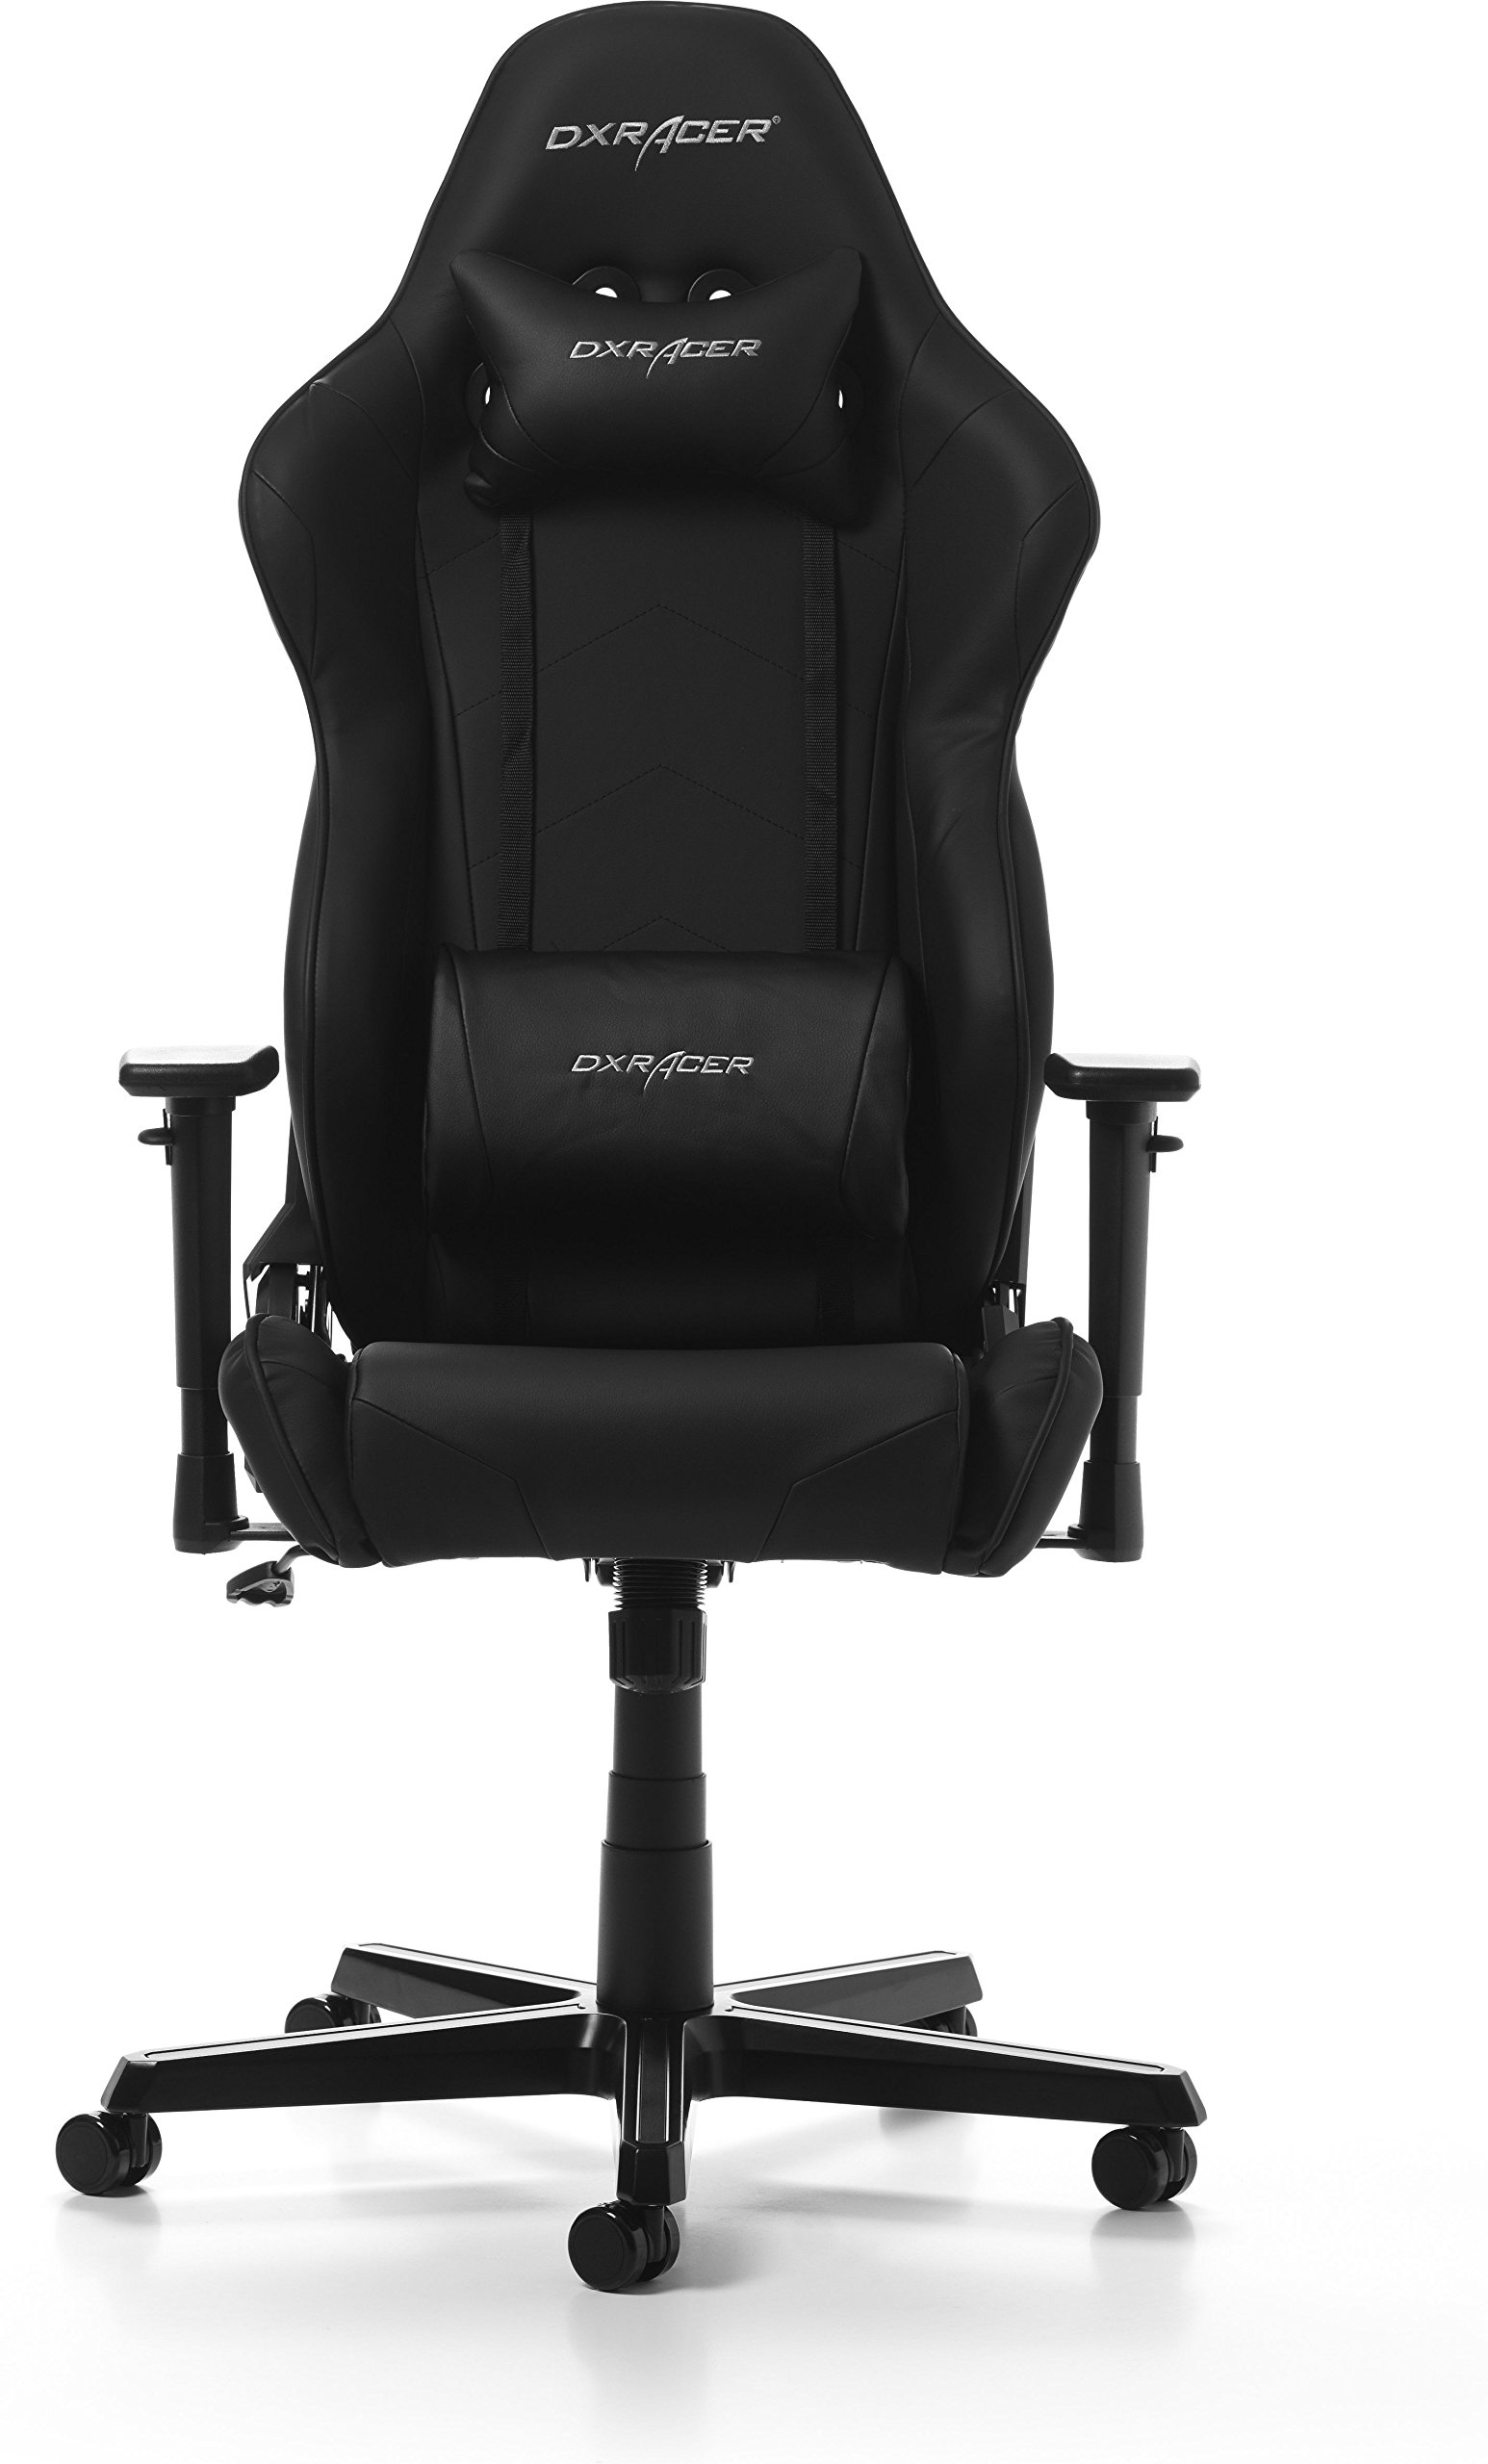 DXRacer Racing Oh/rz0/N Gaming Silla, Piel sintética, Color Negro, 67x 67x 132cm